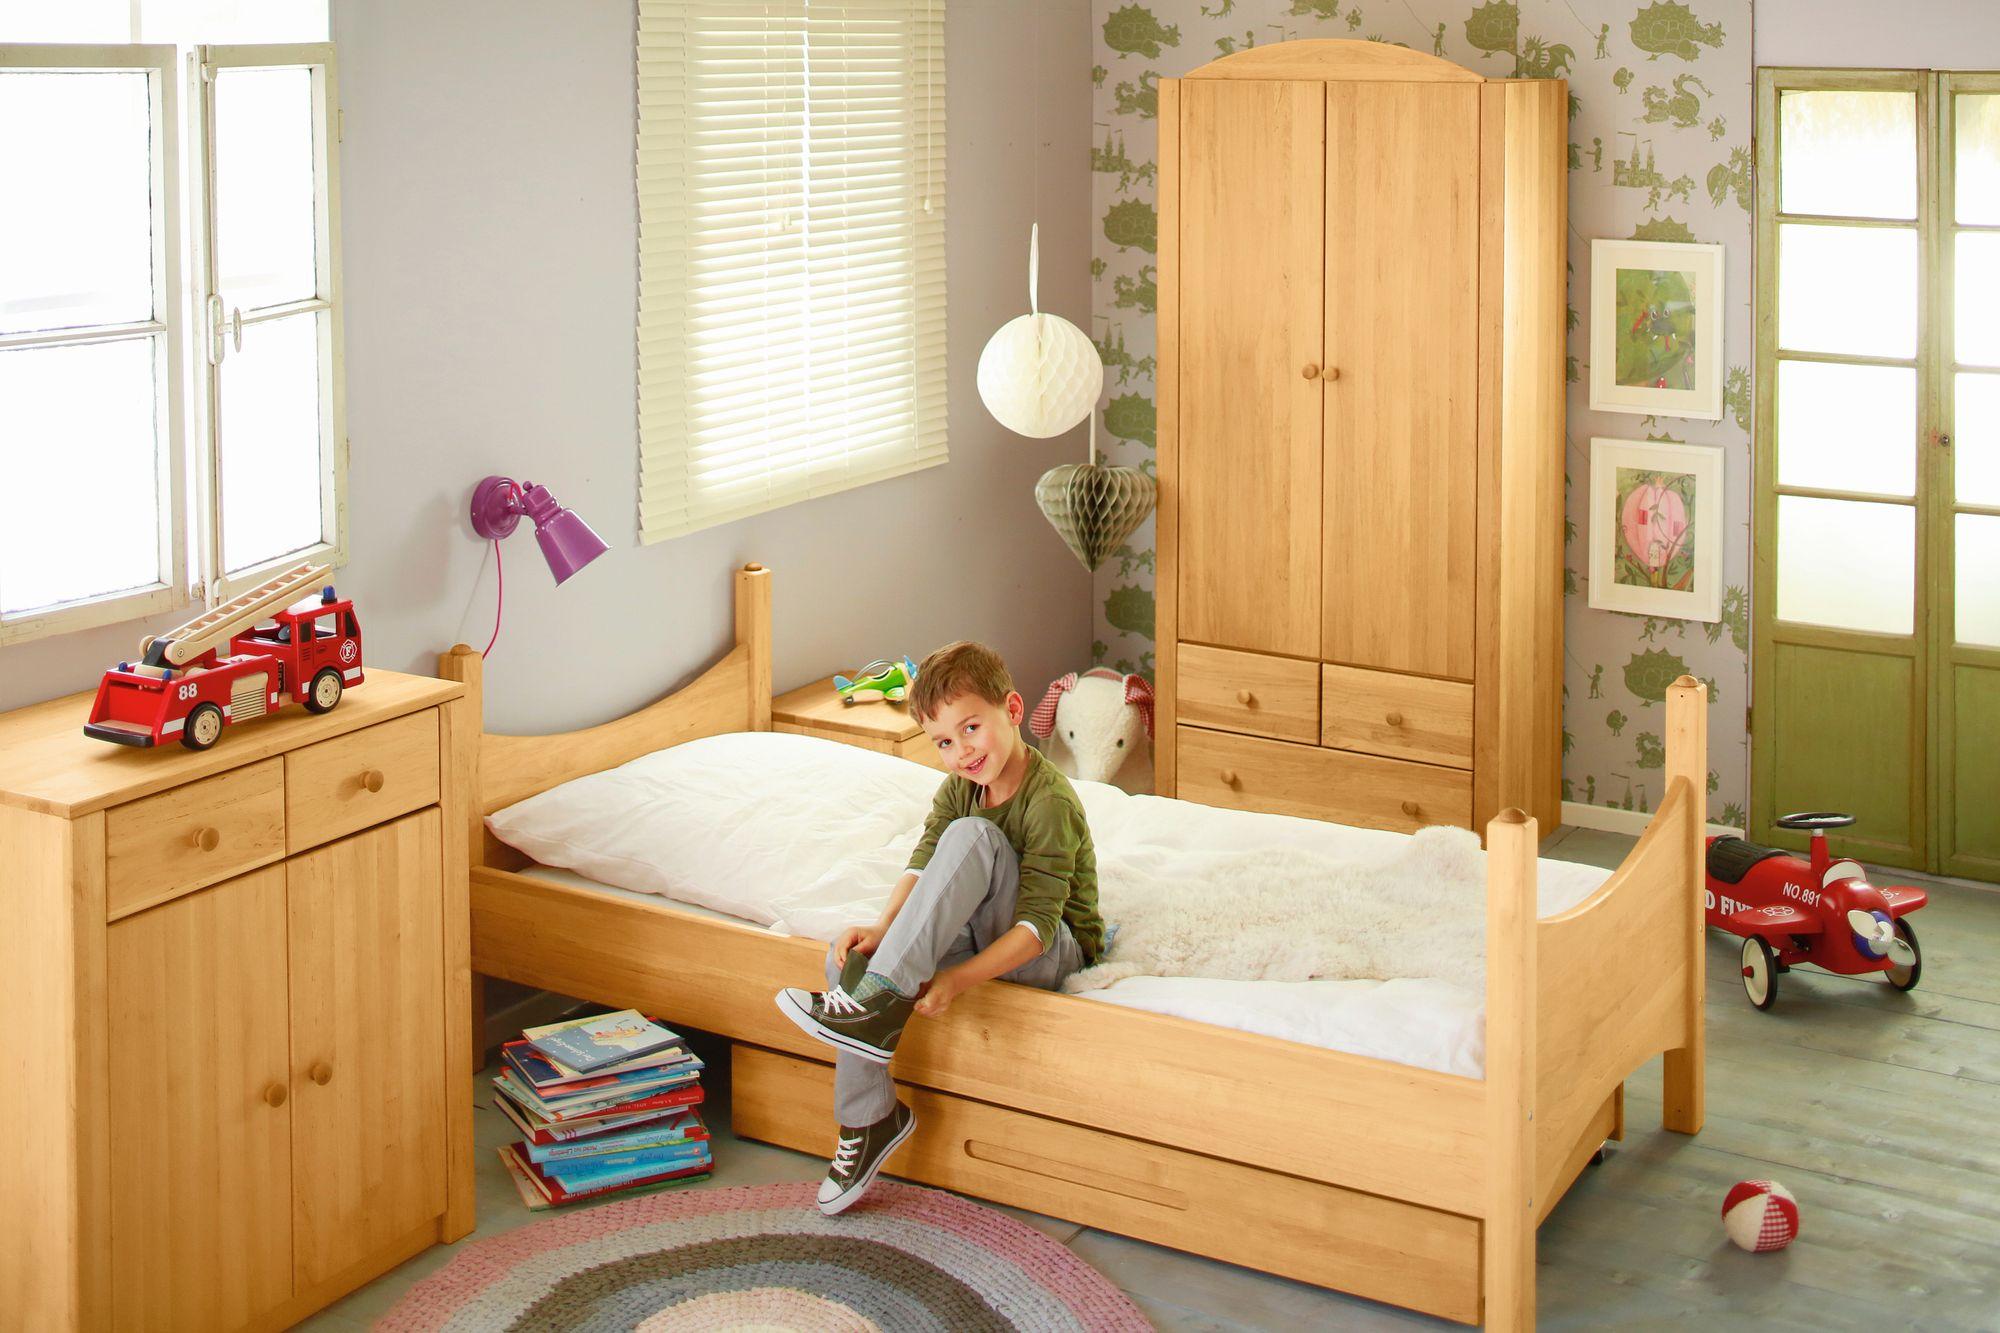 Full Size of Kinderzimmer Komplett Günstig Bioset Noah Erle Regale Bett Sofa Kaufen Schlafzimmer Guenstig Günstige Betten 140x200 Bad Komplettset Komplettes Fenster Regal Kinderzimmer Kinderzimmer Komplett Günstig